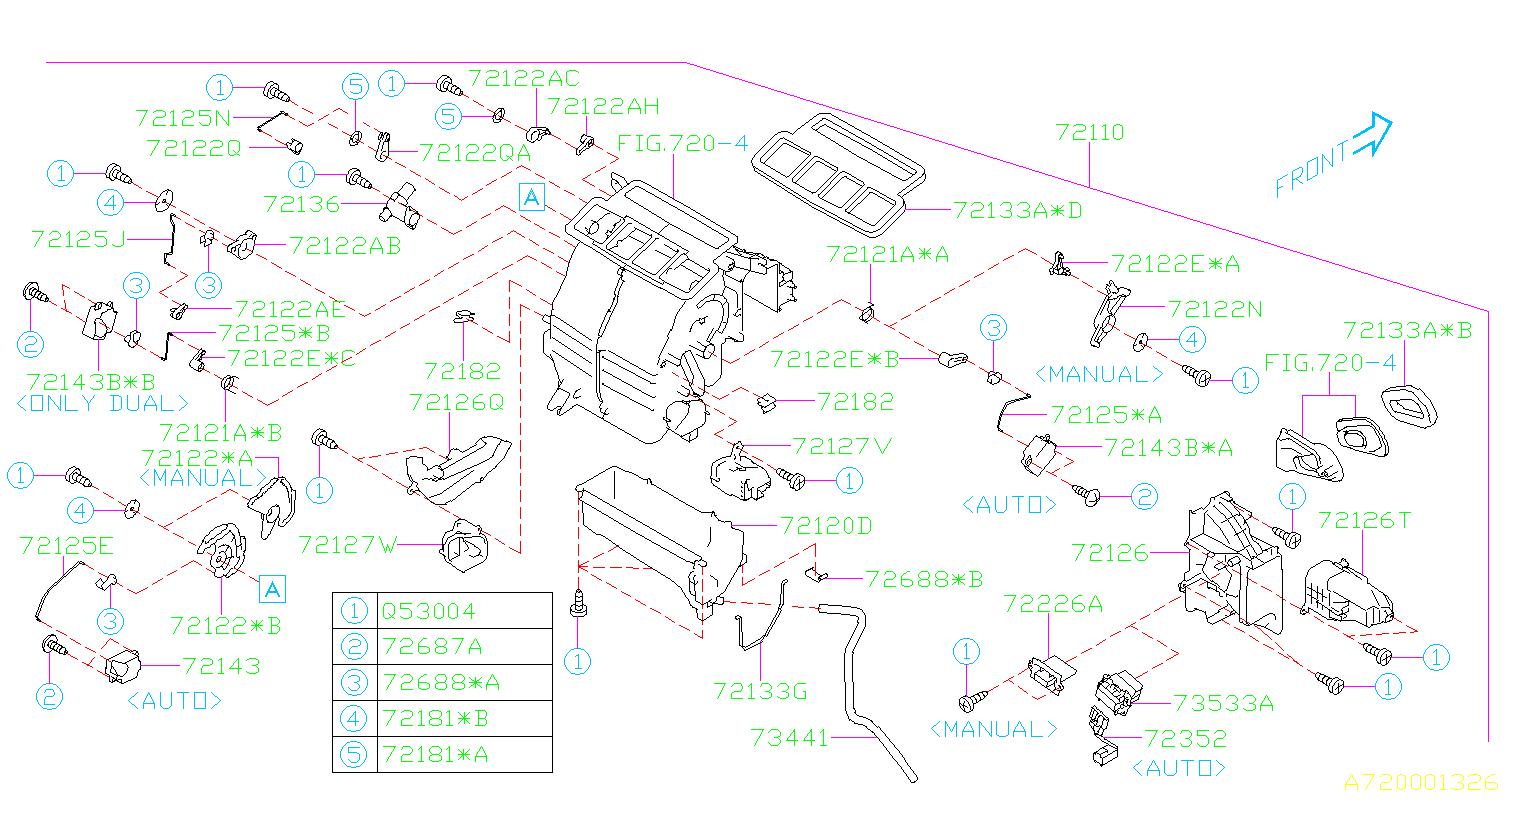 72226fg001 - Resistance  Heater  System  Unit